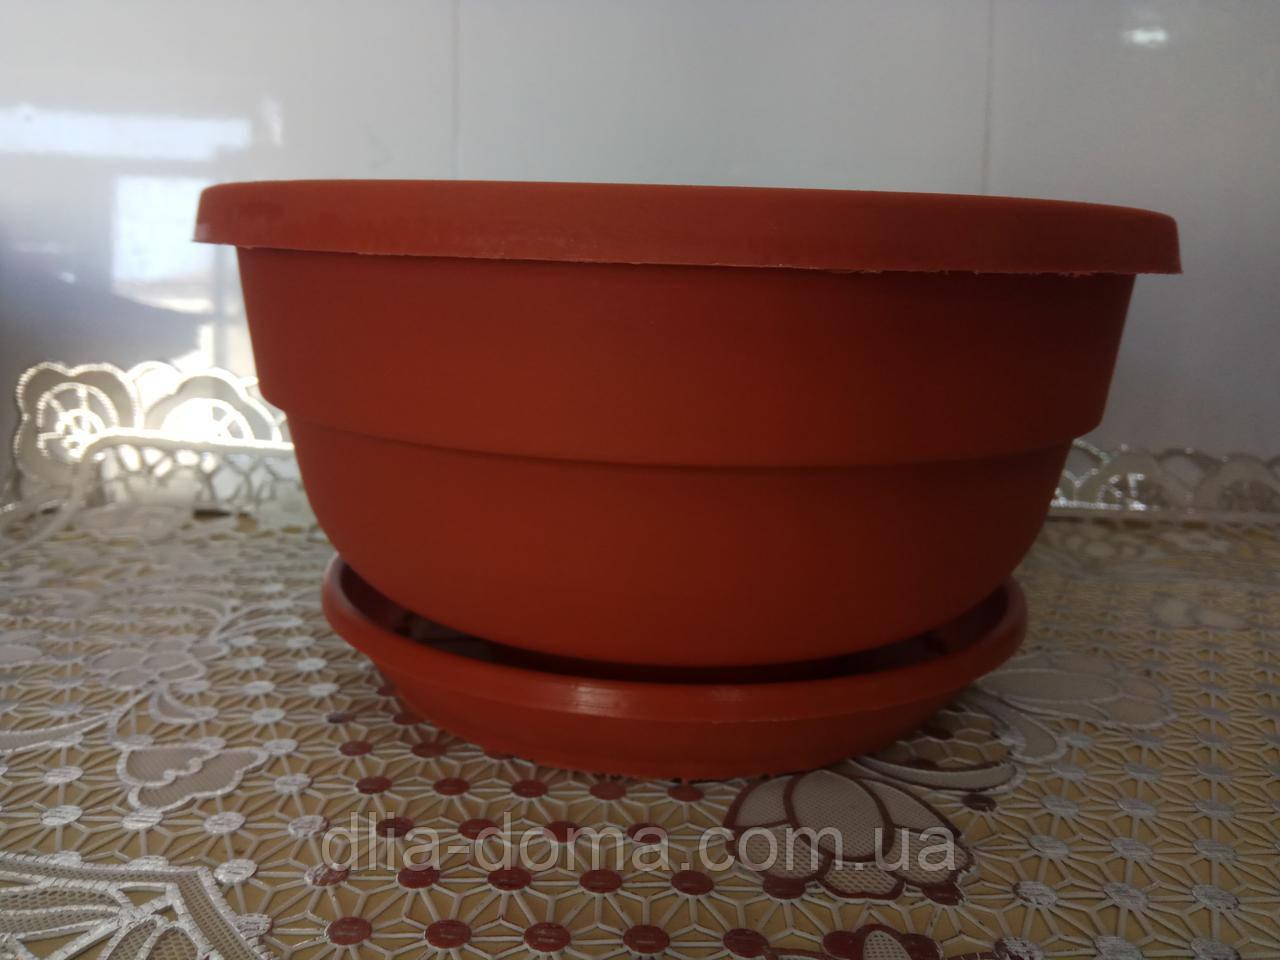 Горшок Фиалка диаметр 210 мм